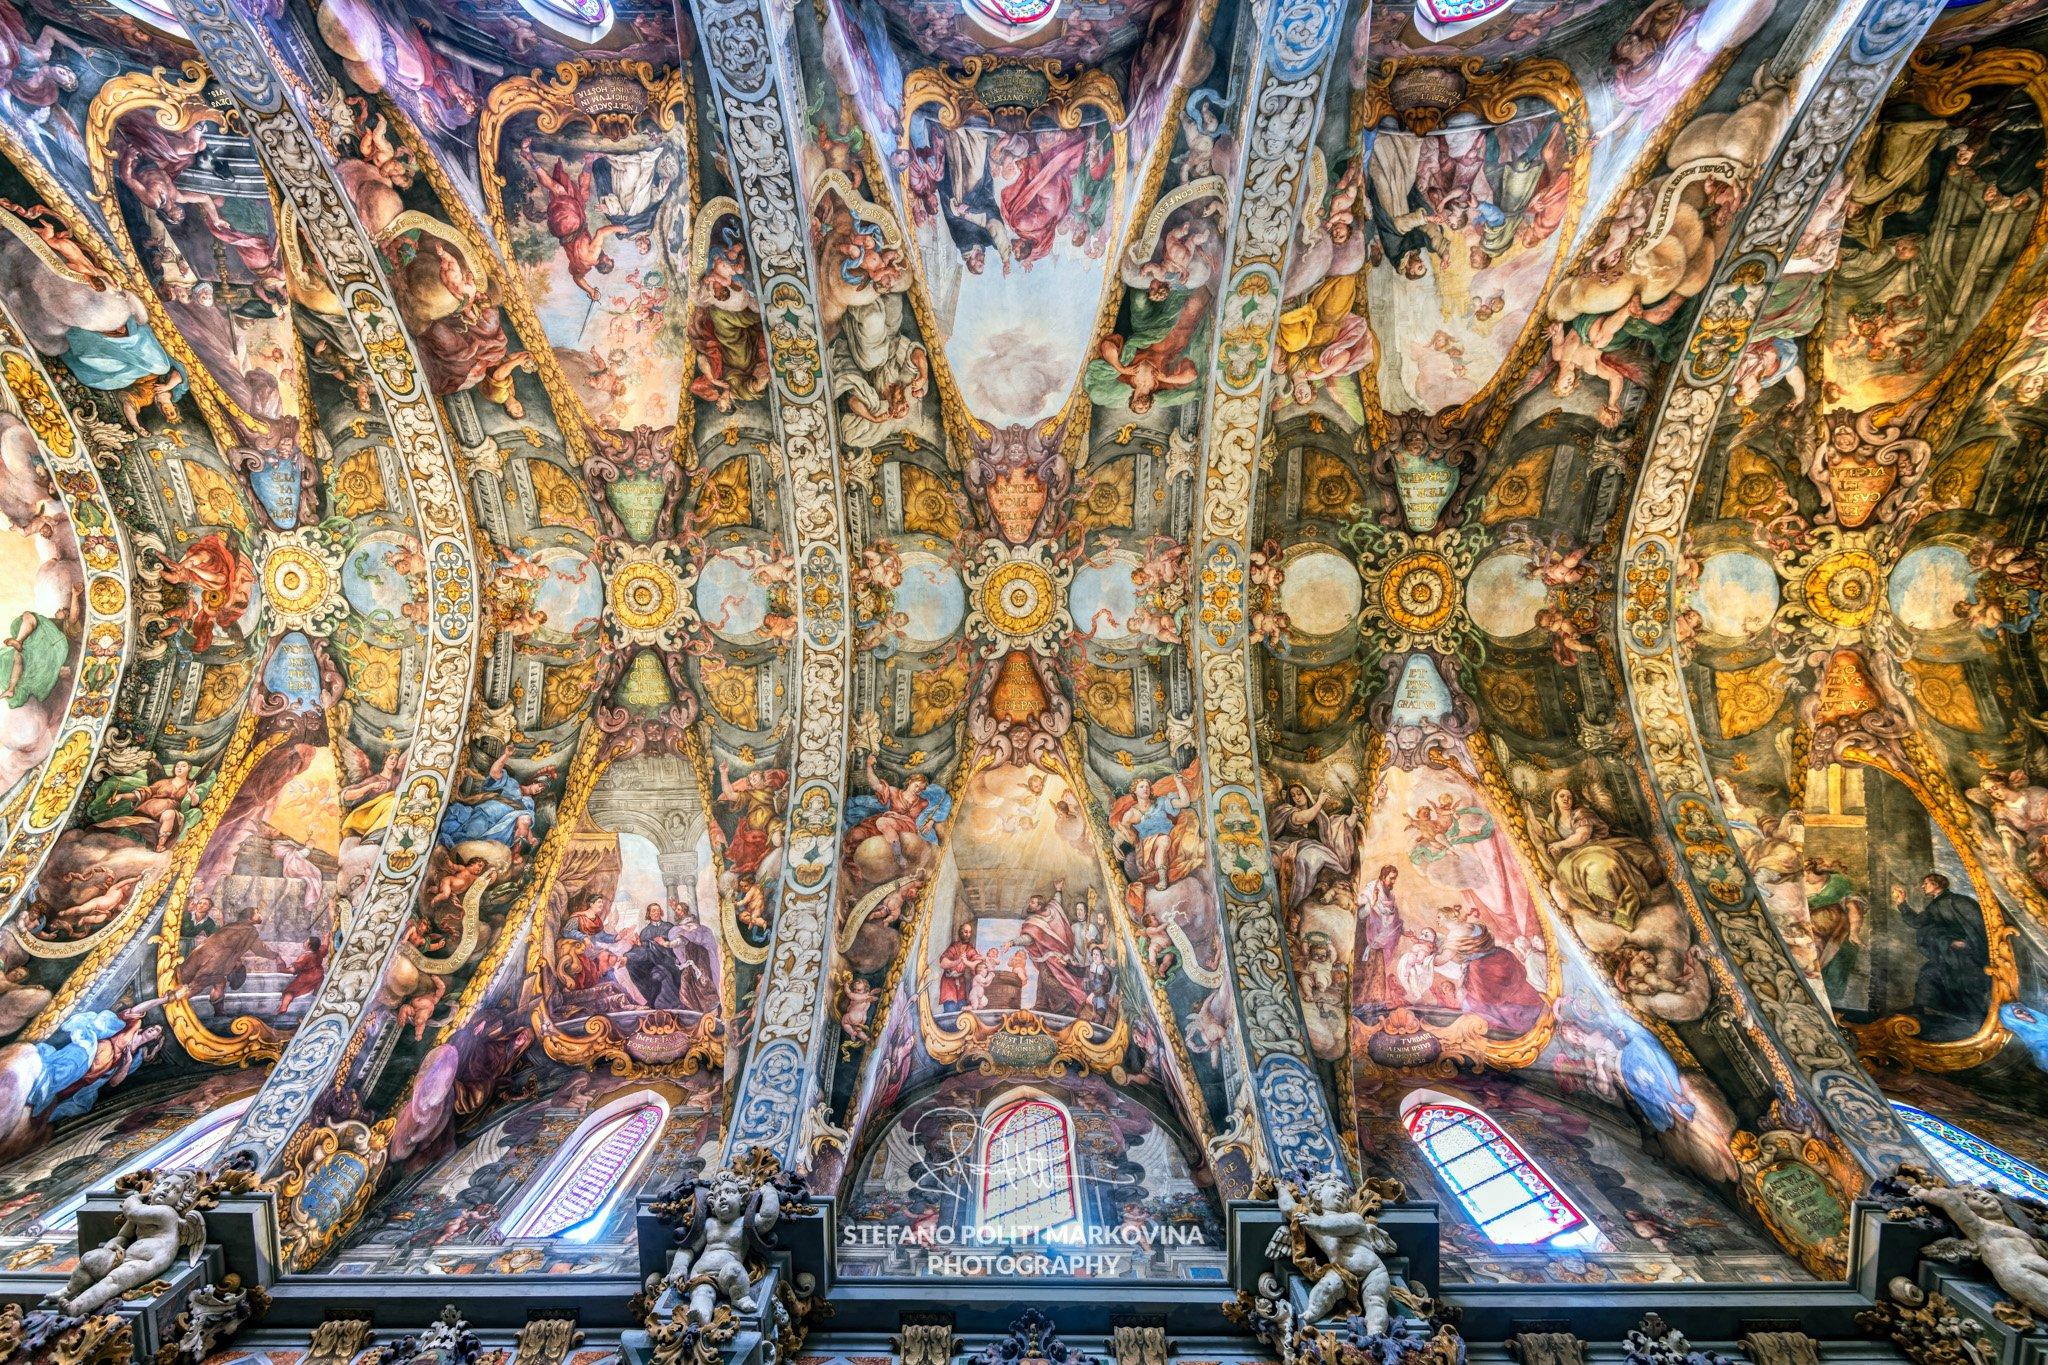 Shooting inside the stunning Church of San Nicholas in Valencia